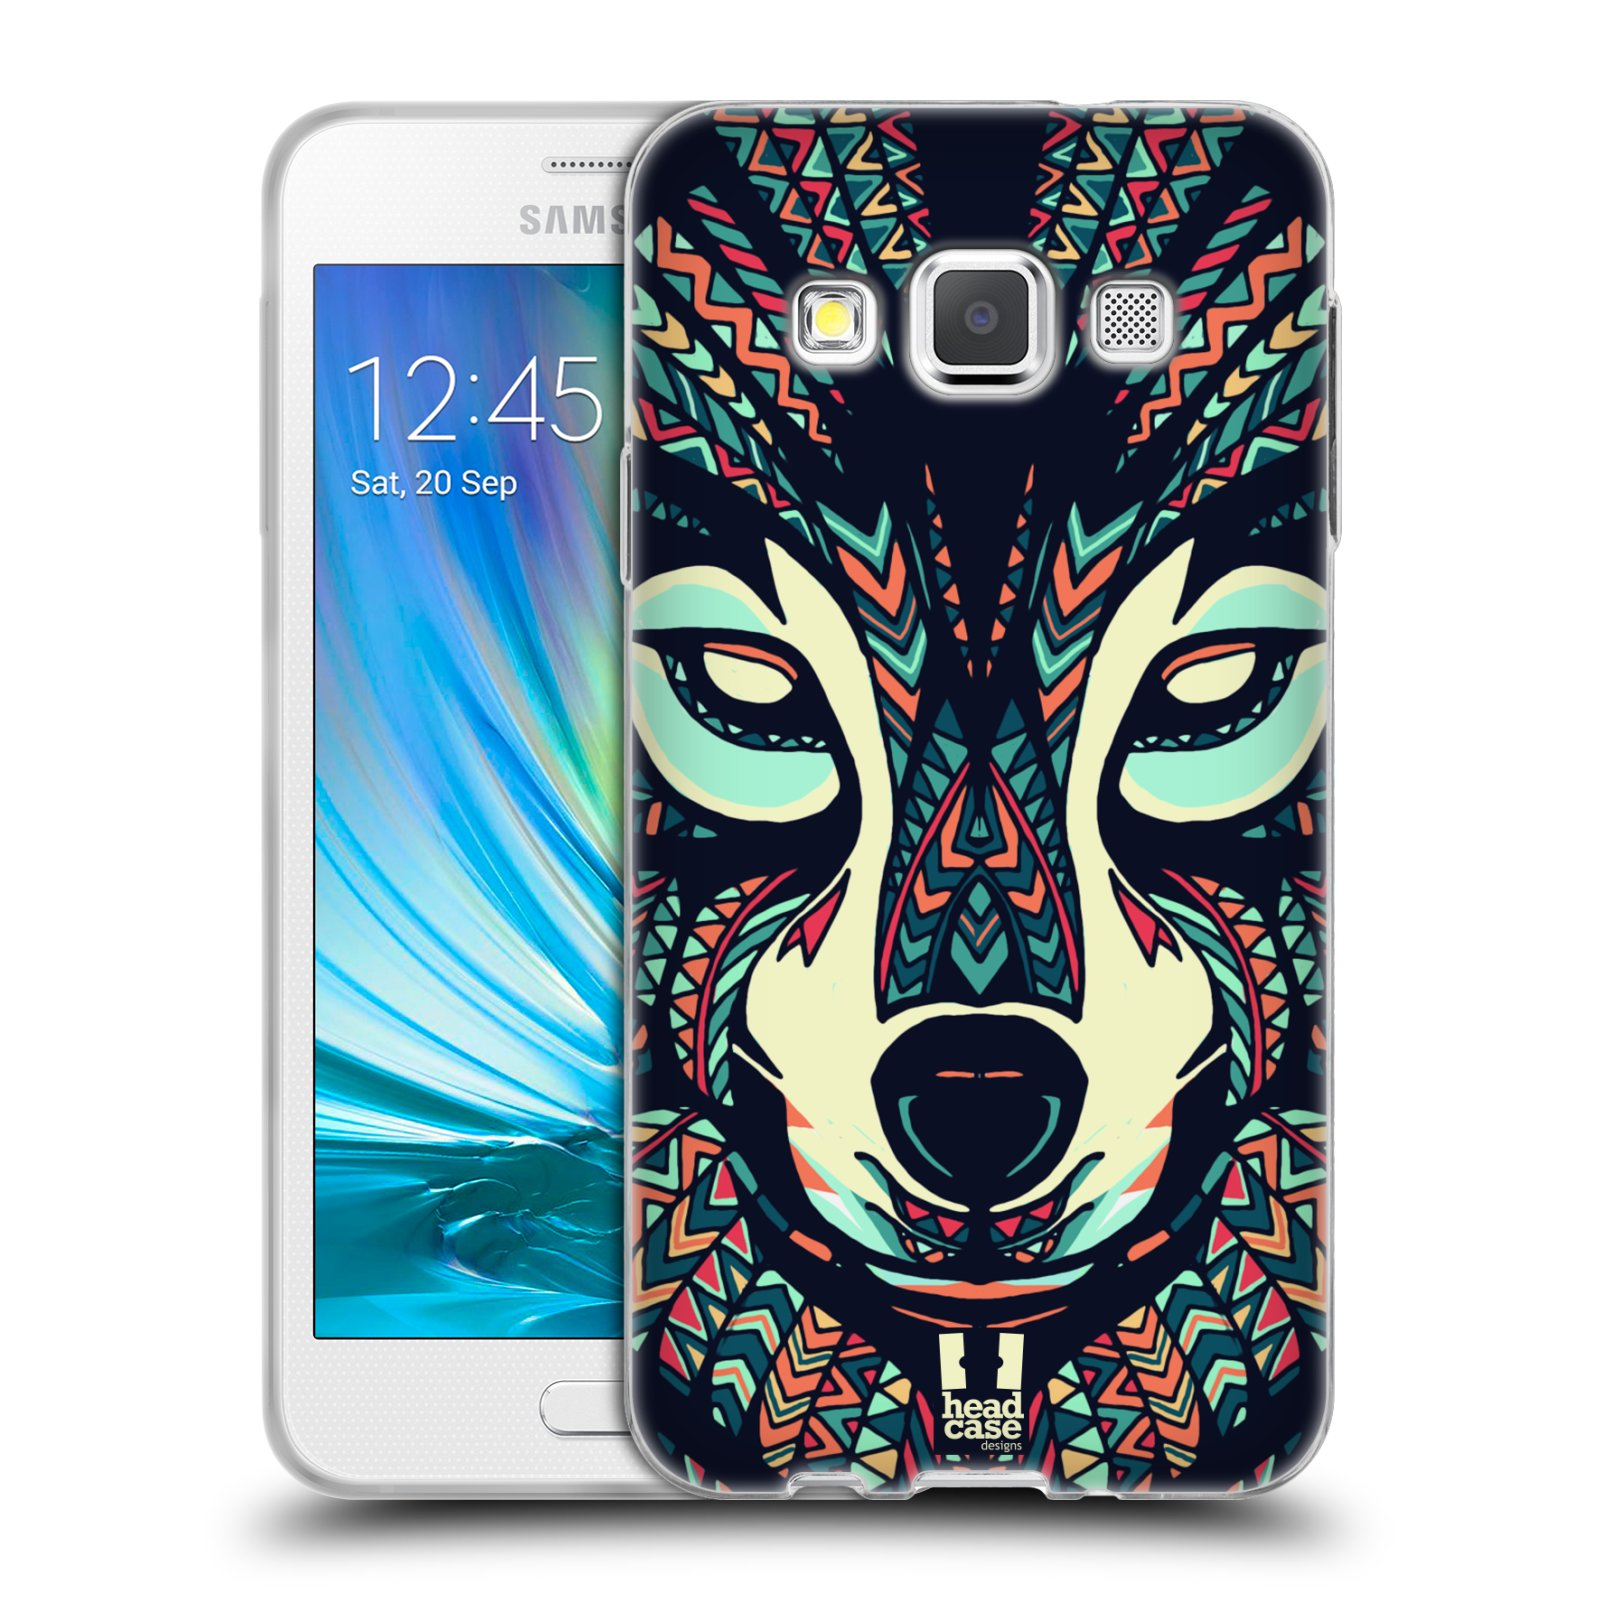 Silikonové pouzdro na mobil Samsung Galaxy A3 HEAD CASE AZTEC VLK